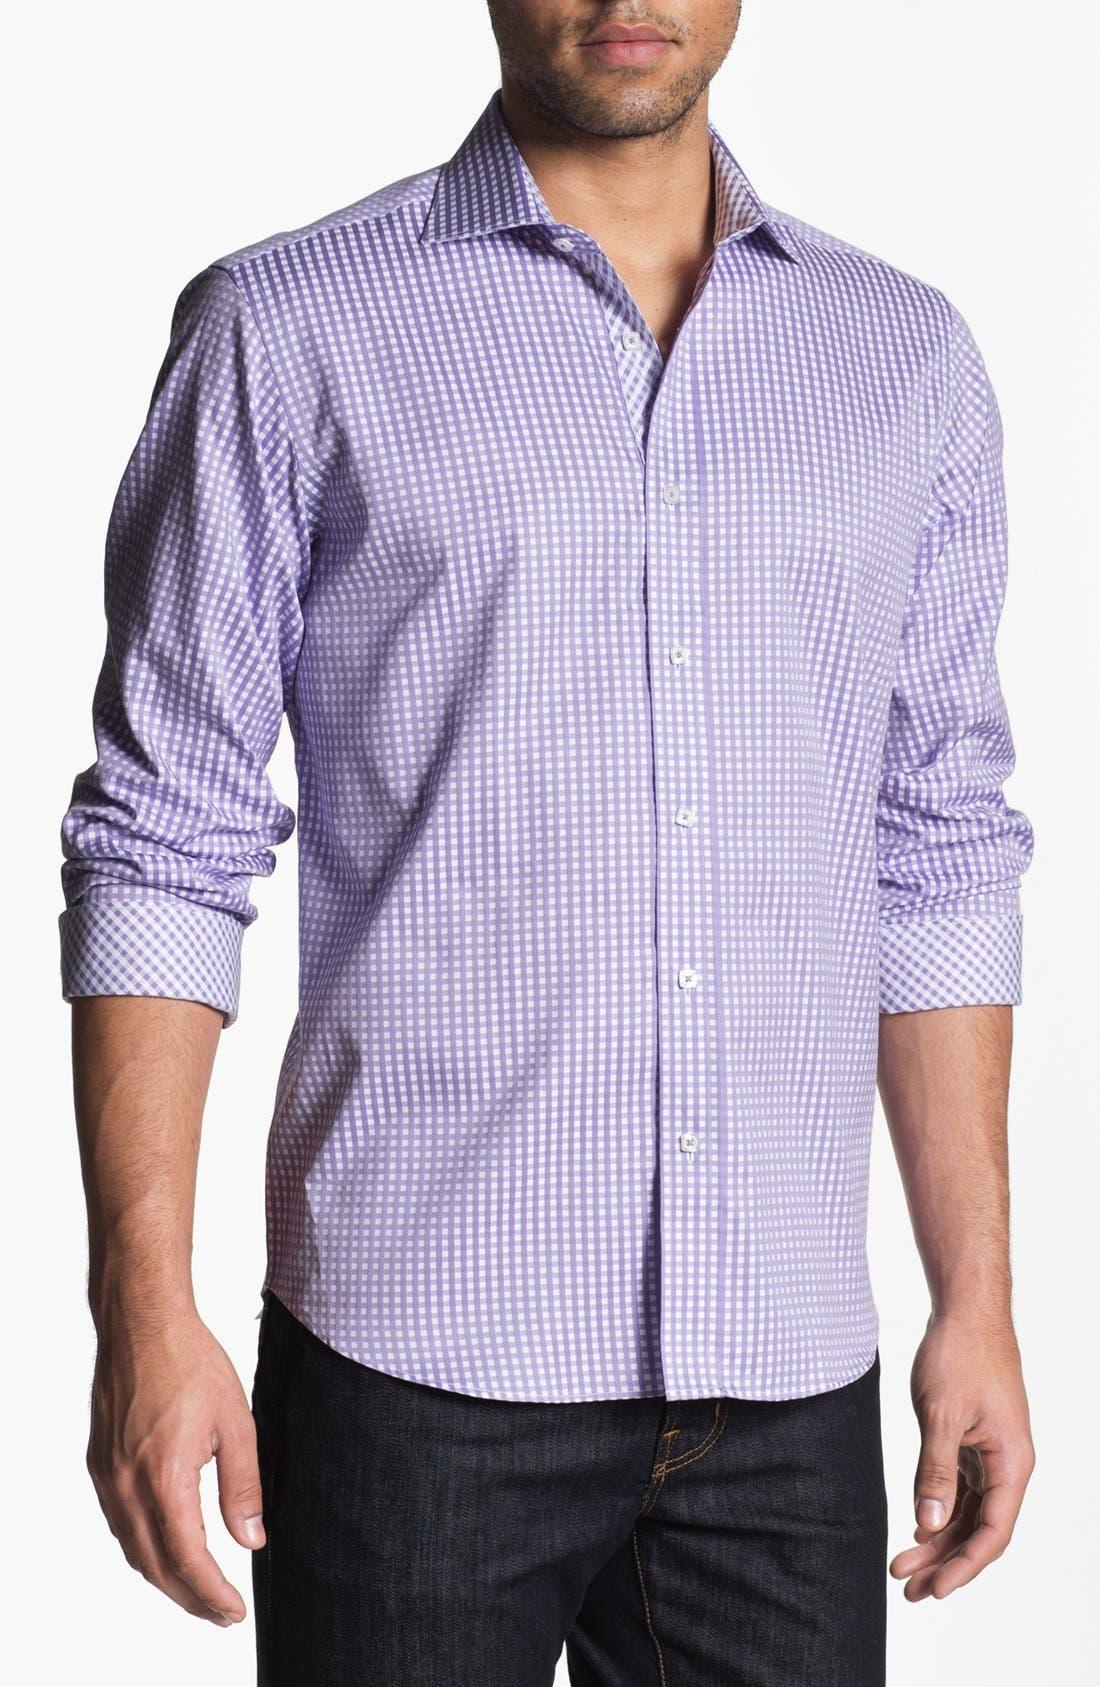 Main Image - Bugatchi Gingham Classic Fit Cotton Sport Shirt